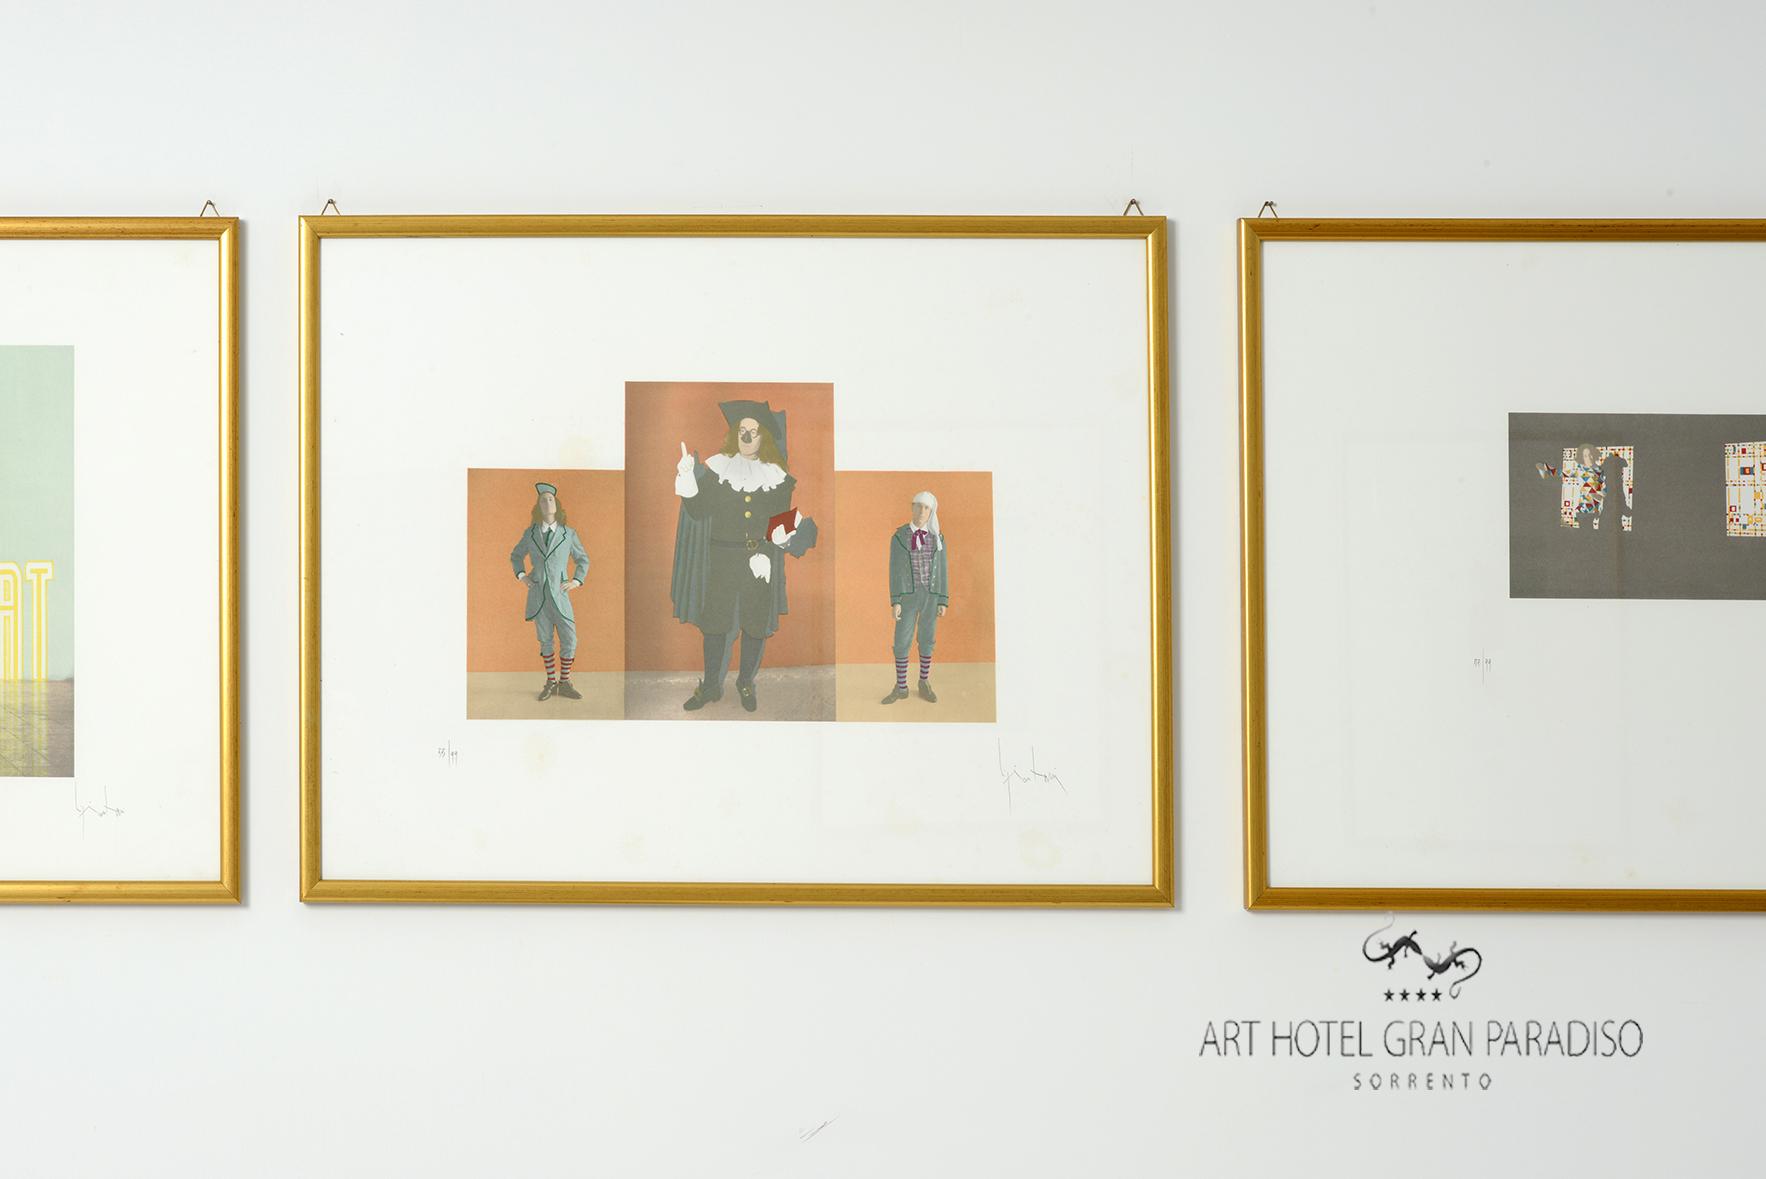 Art_Hotel_Gran_Paradiso_2013_411_Luigi_Ontani_7.jpg